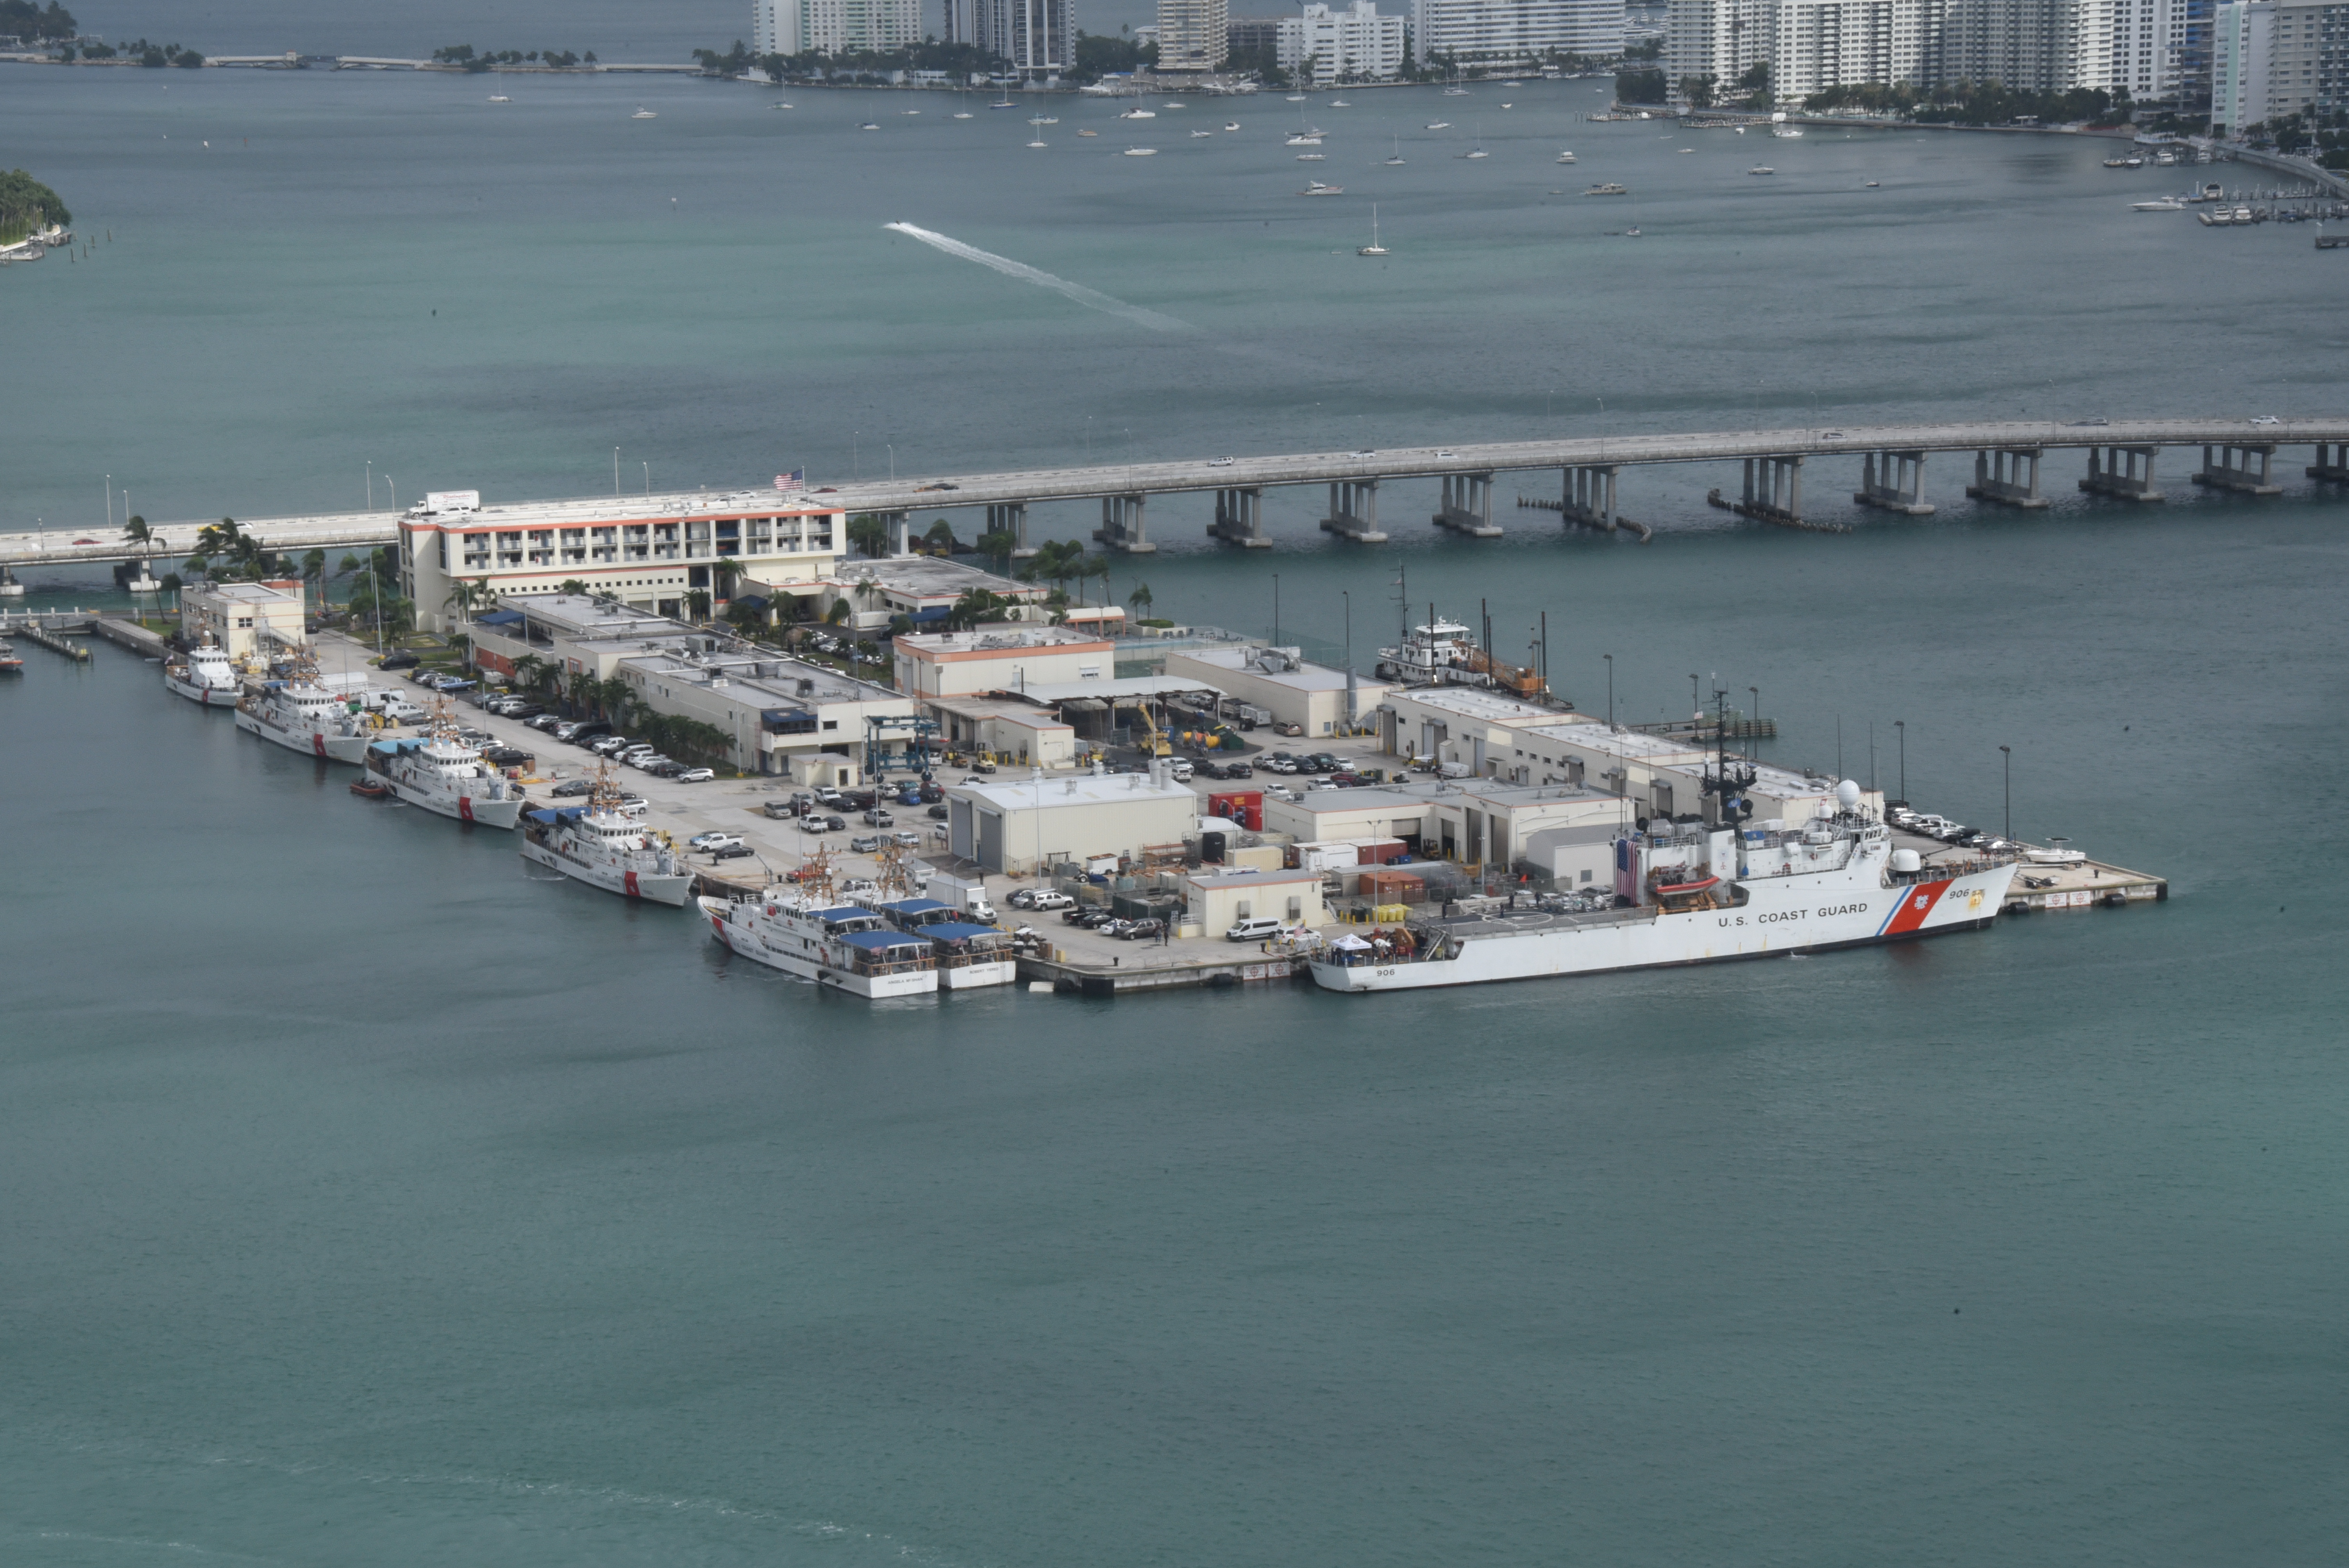 Coast Guard seizes more than 12,000 pounds of cocaine